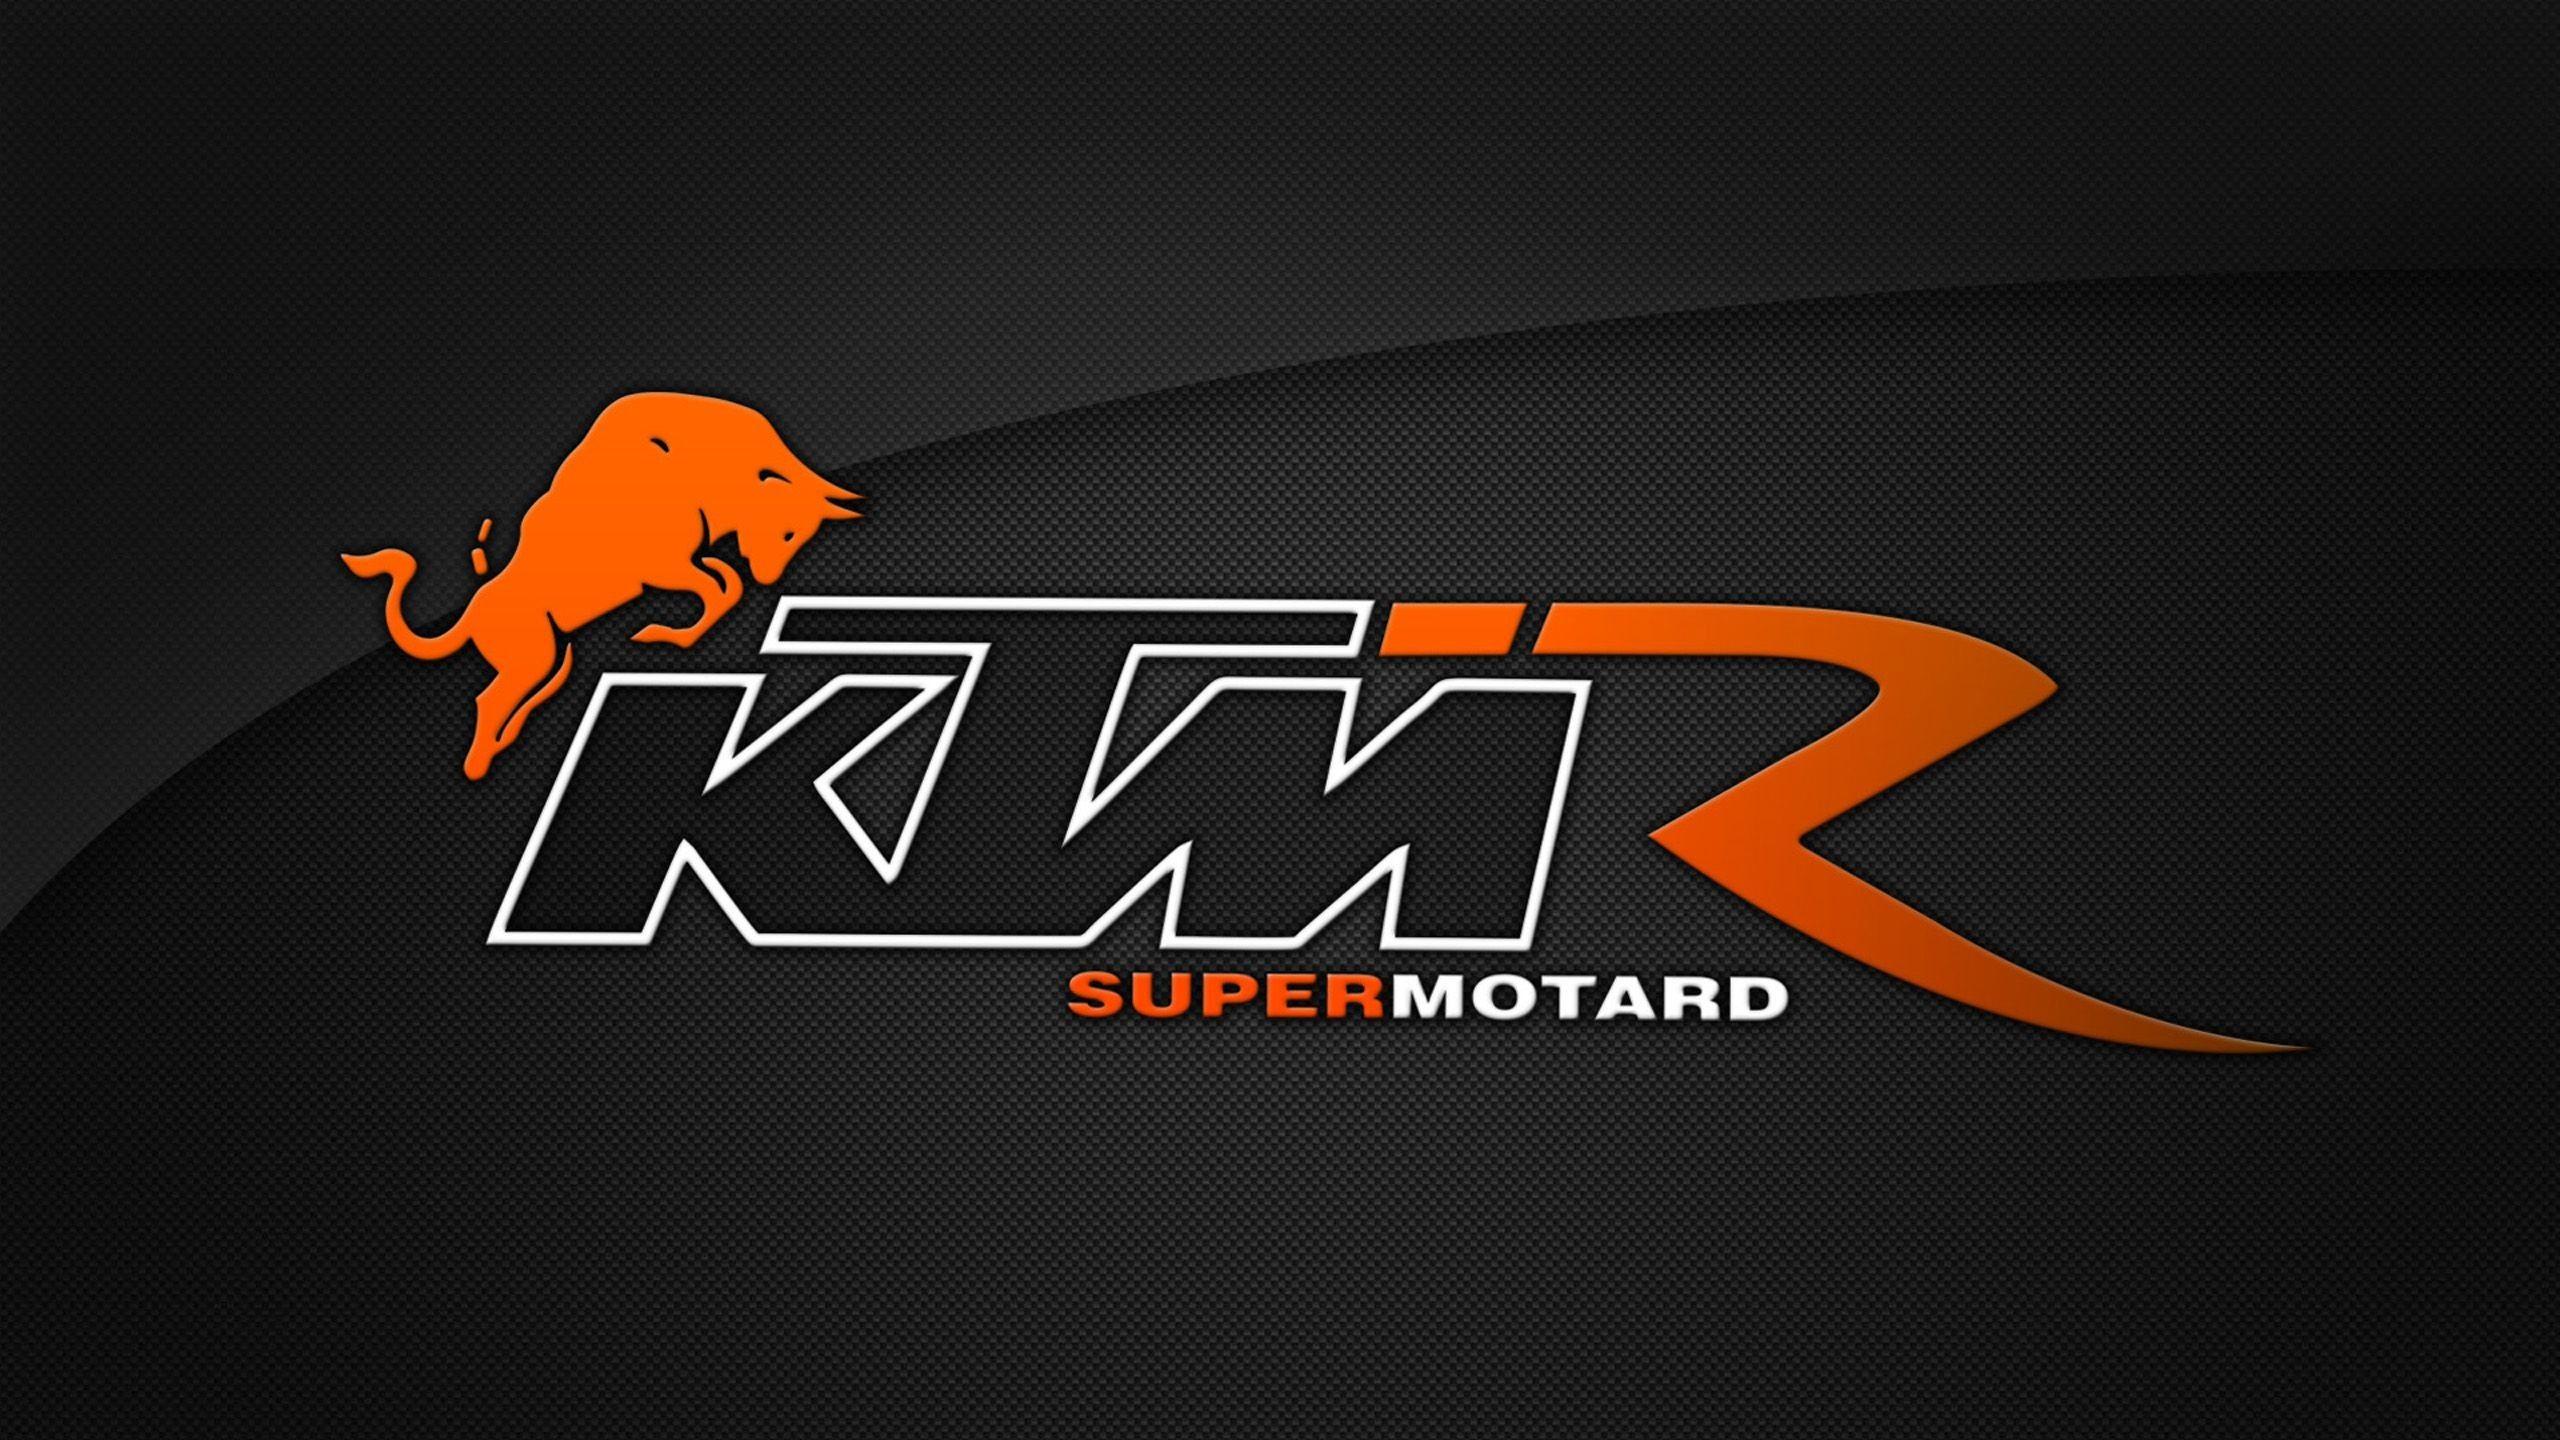 Ktm Logo Wallpaper Hddownload Ktm Logo Wallpaper Hd 2560x1440 Mobile Pic Wpxh446544 Xshyfc Com Ktm Motocross Logo Ktm Supermoto